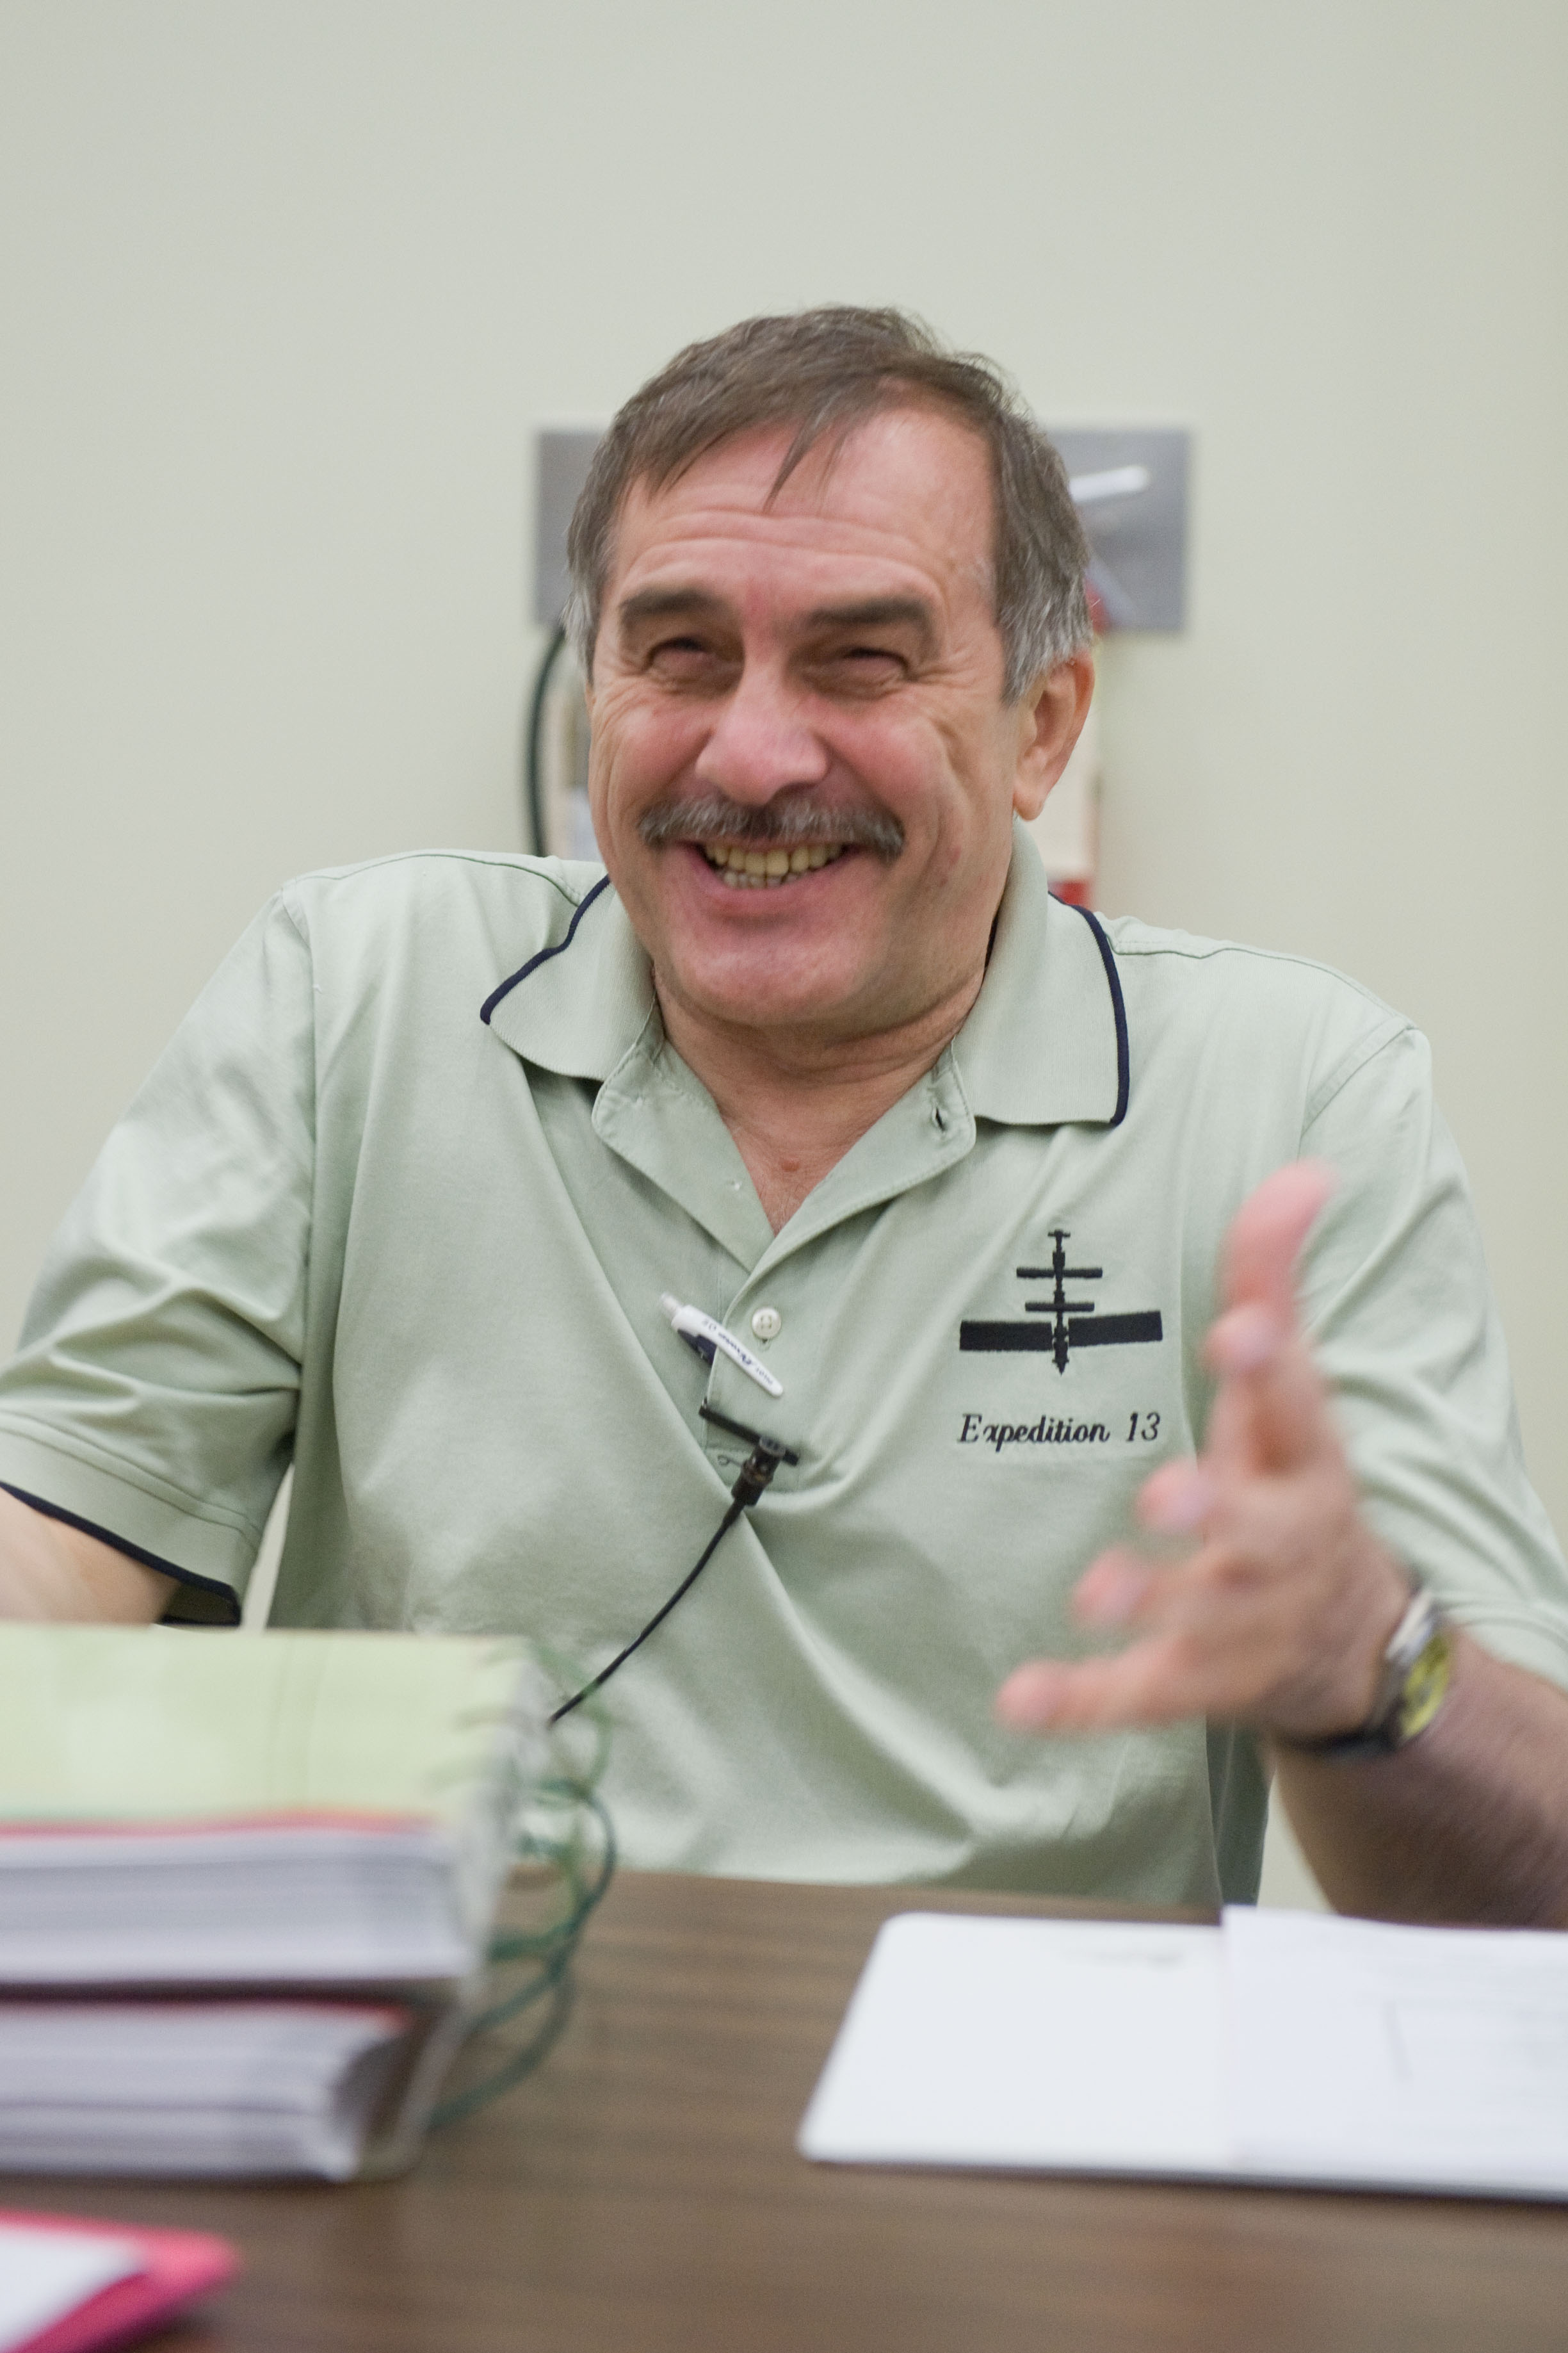 Russian cosmonaut Pavel Vinogradov